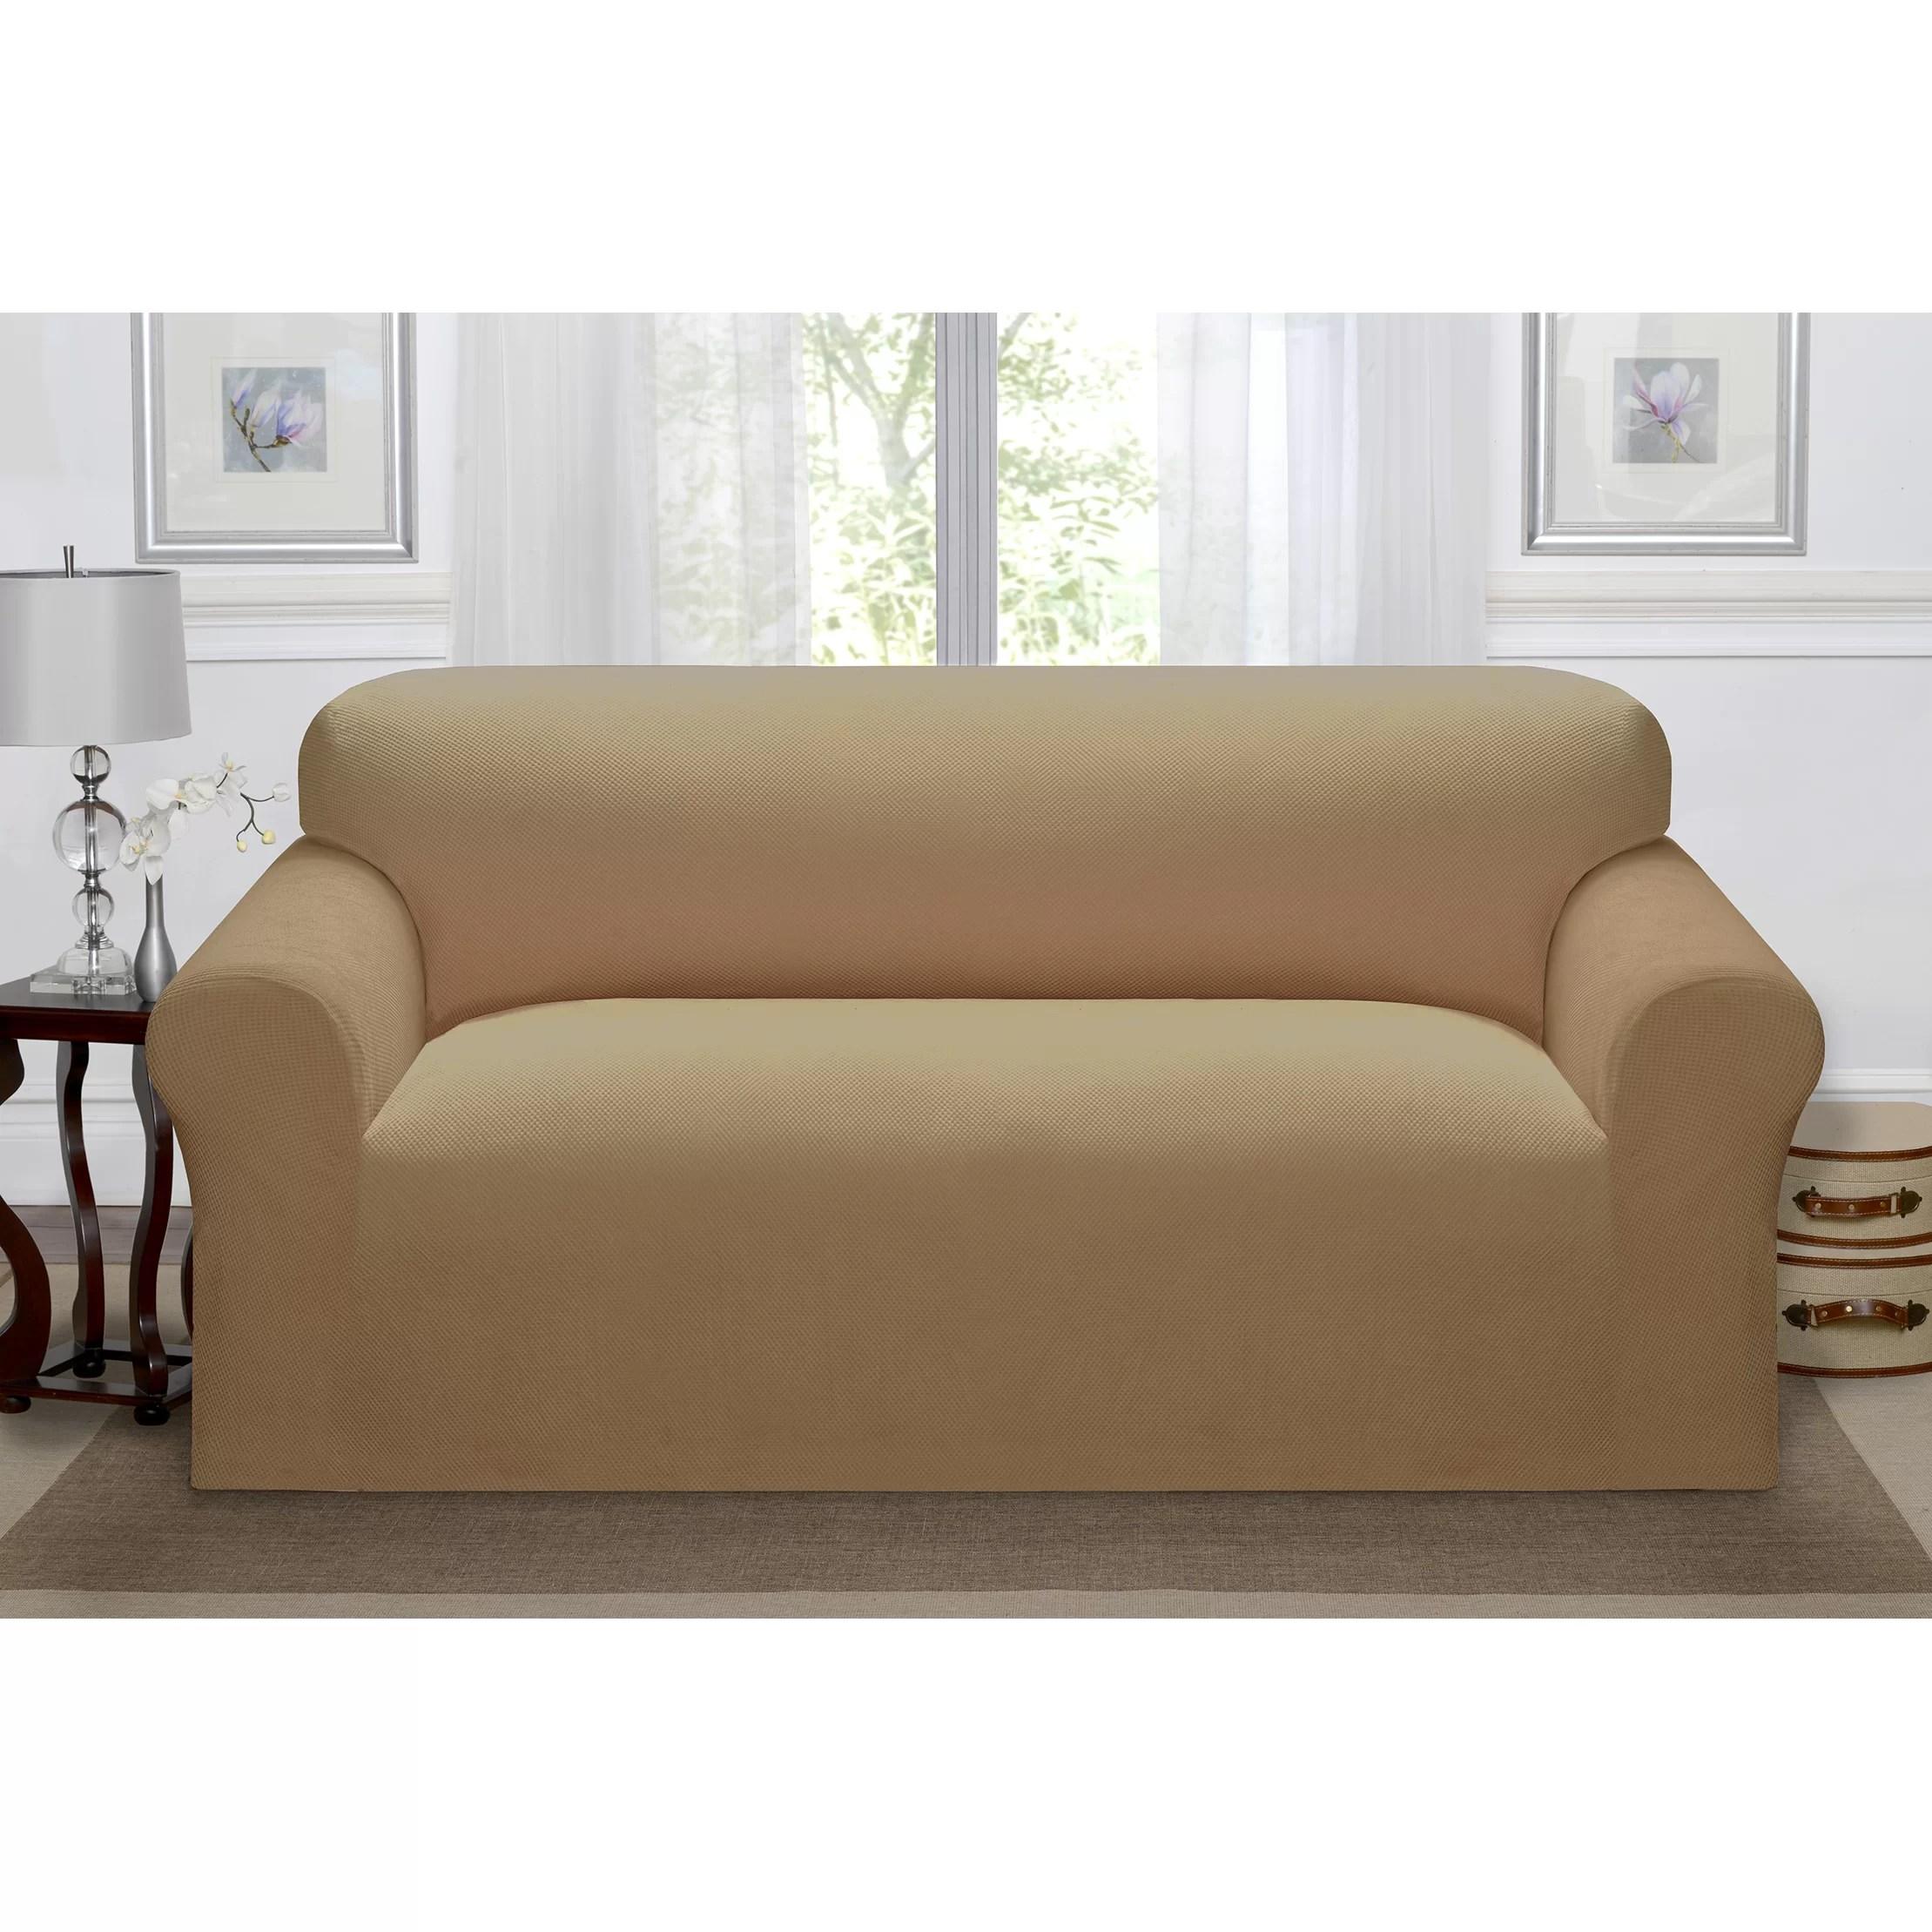 Kathy Ireland Furniture Sofa Part 70